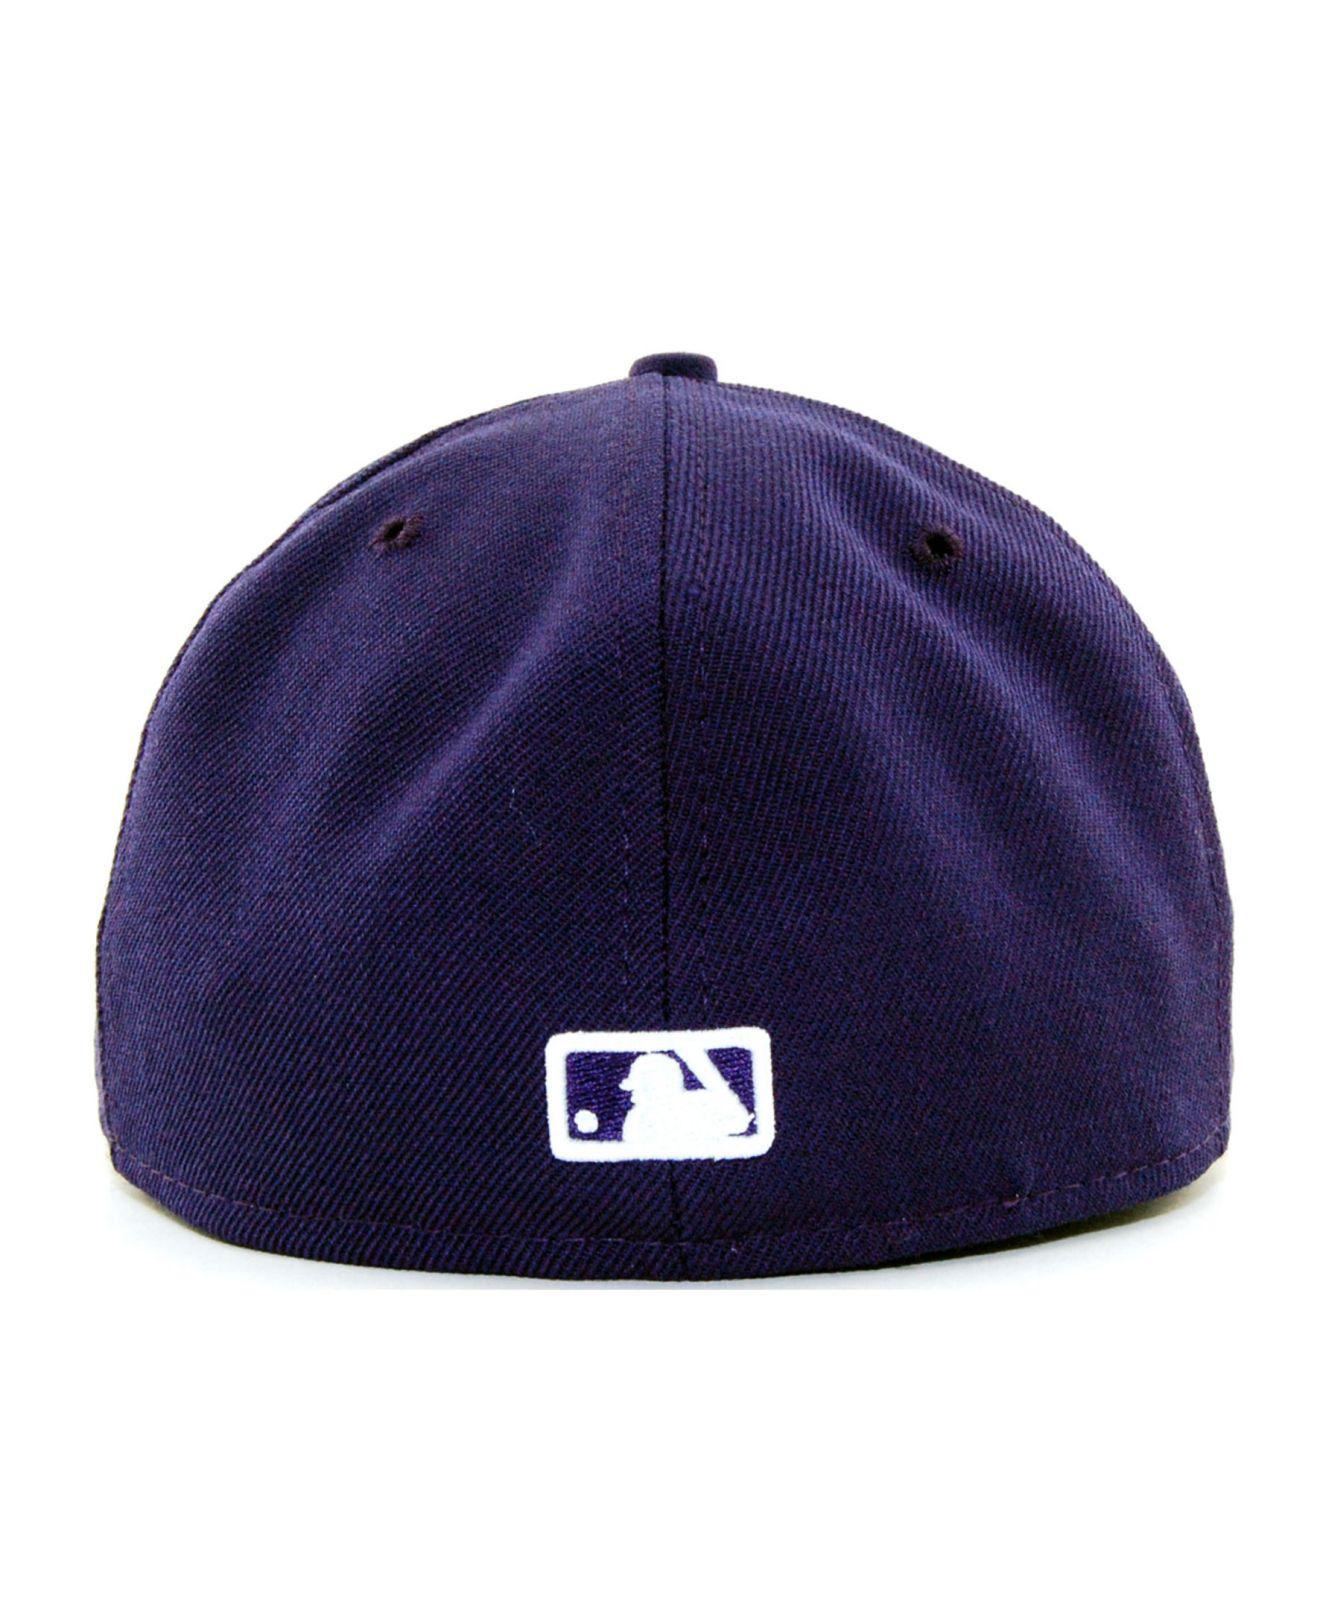 size 40 38ea8 93238 ... sweden lyst ktz chicago white sox c dub 59fifty cap in purple for men  bd073 6baed